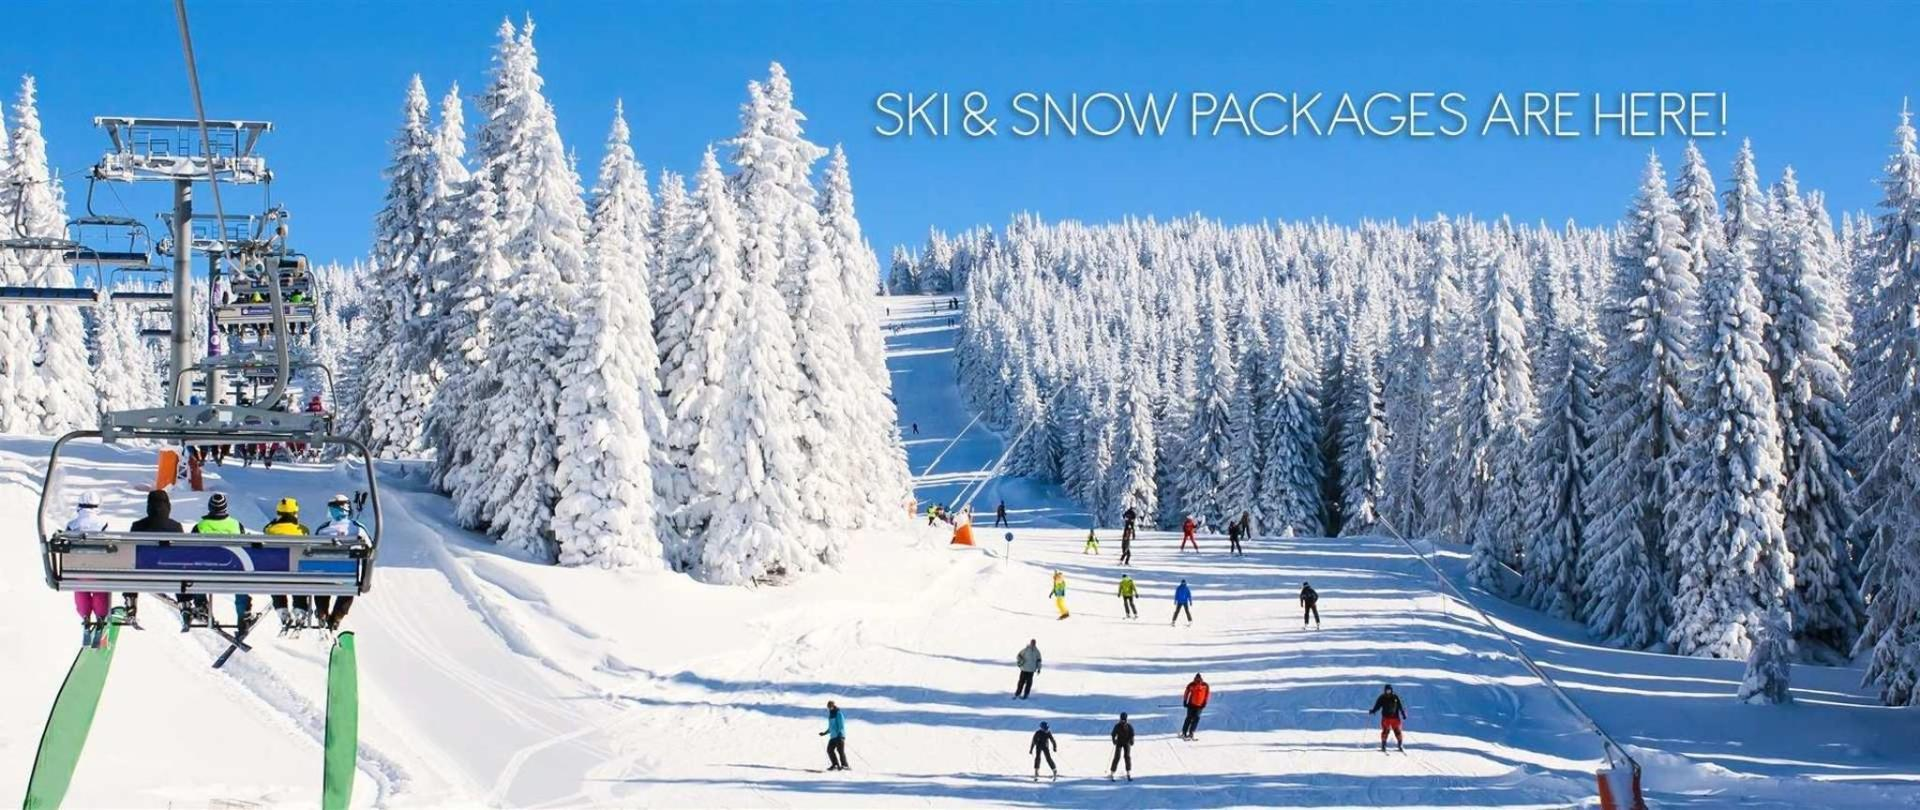 ski-packages-berkshires-banner.jpg.1920x810_default.jpeg.1920x0.jpeg